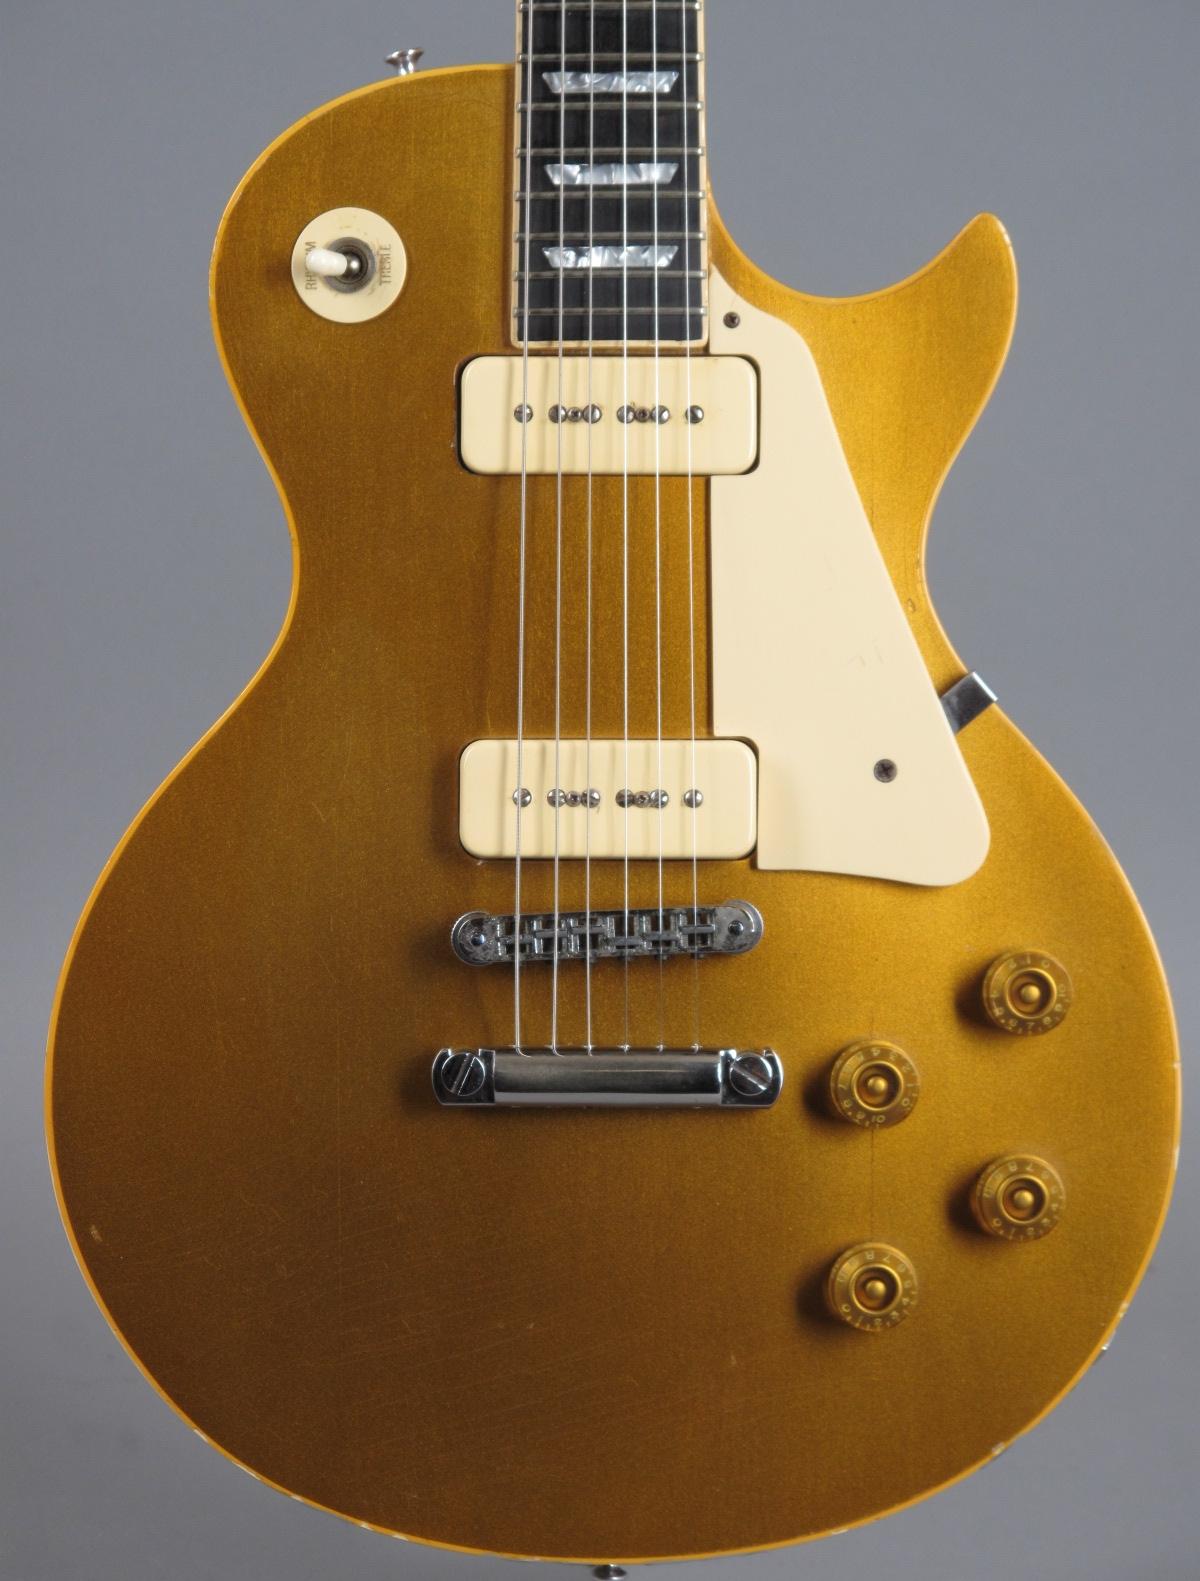 1980 Gibson Les Paul Pro - Goldtop